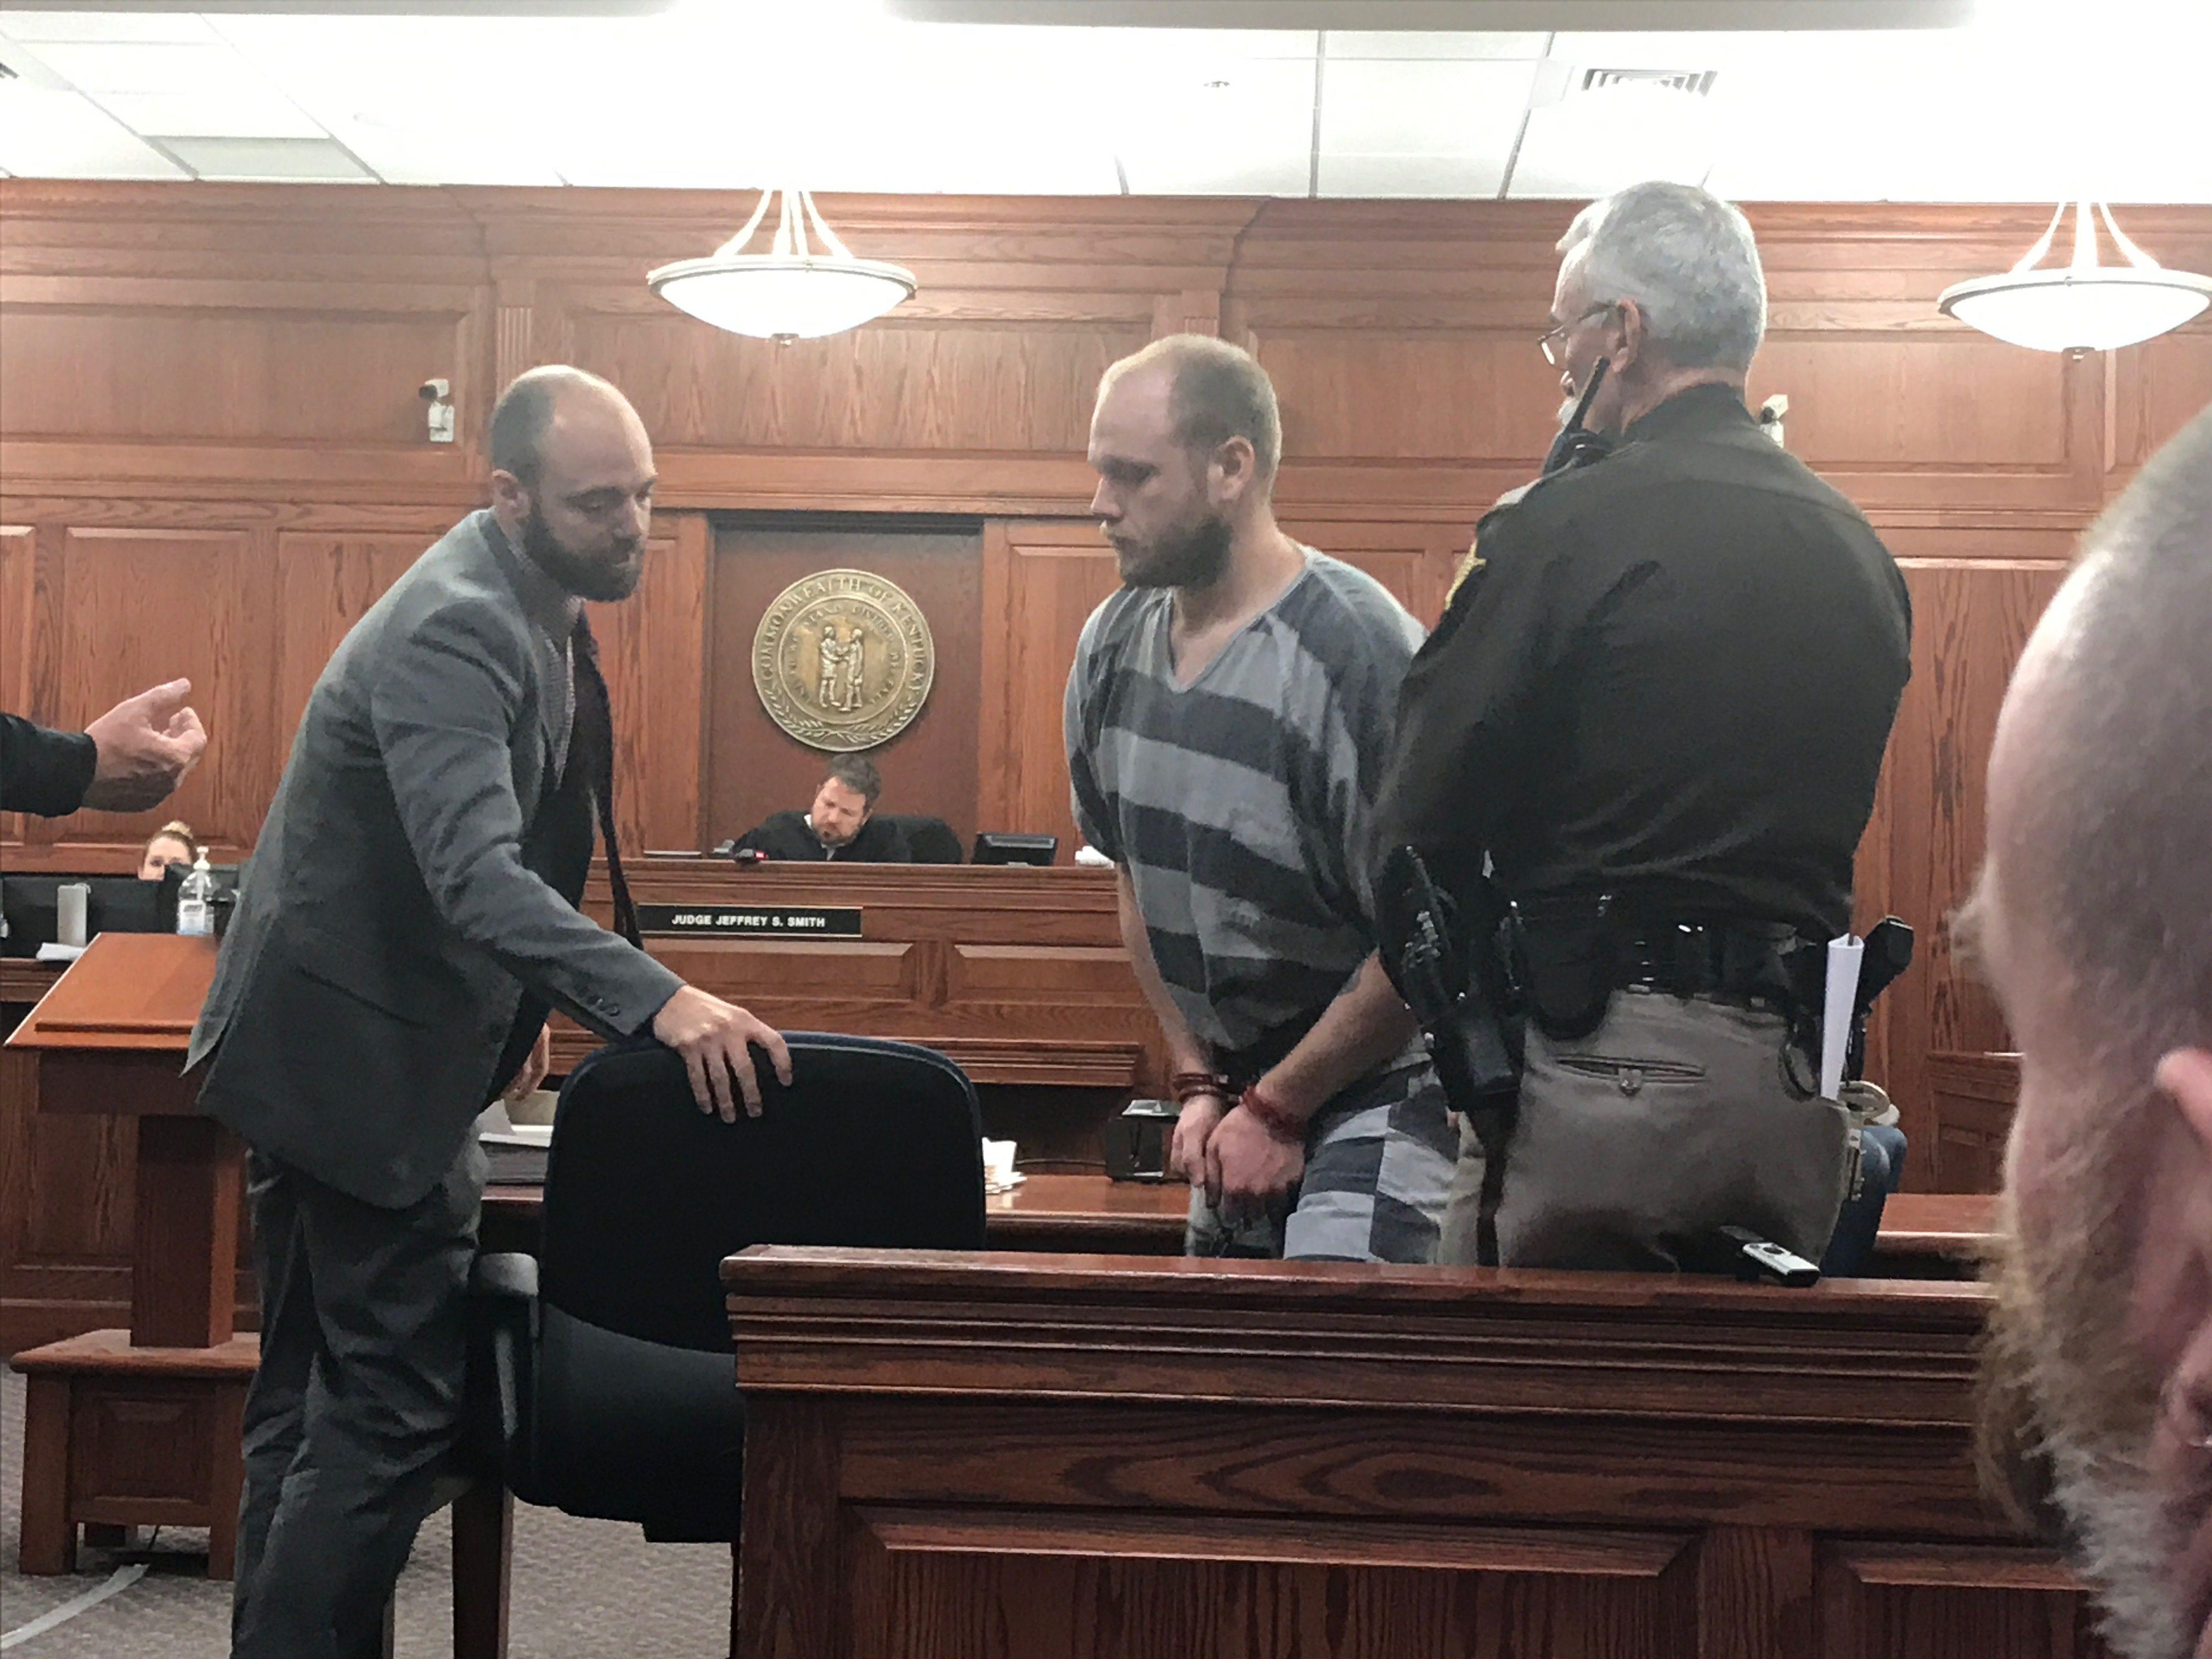 Grand jury to consider murder charge against Burlington man